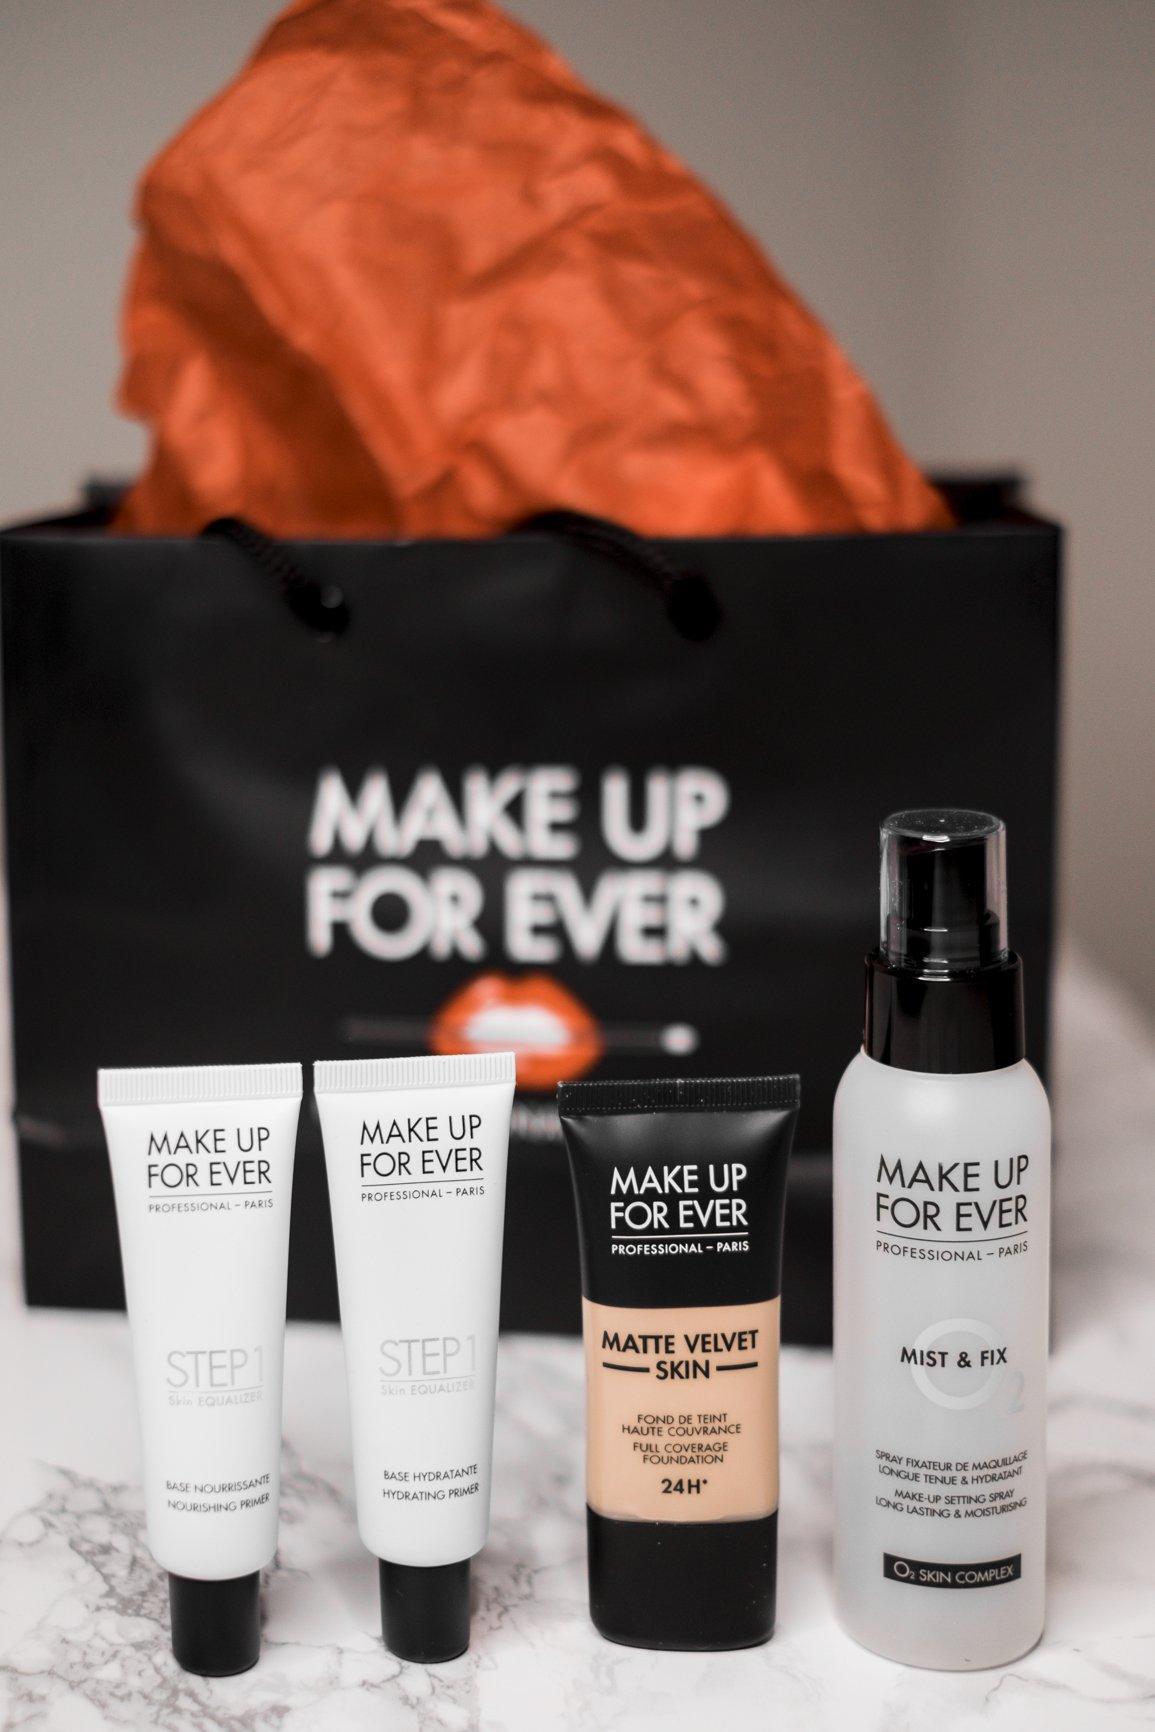 sunkissedblush-makeupforever-masterclass-houston-hotel-zaza-matte-velvet-skin-foundation (1 of 2)